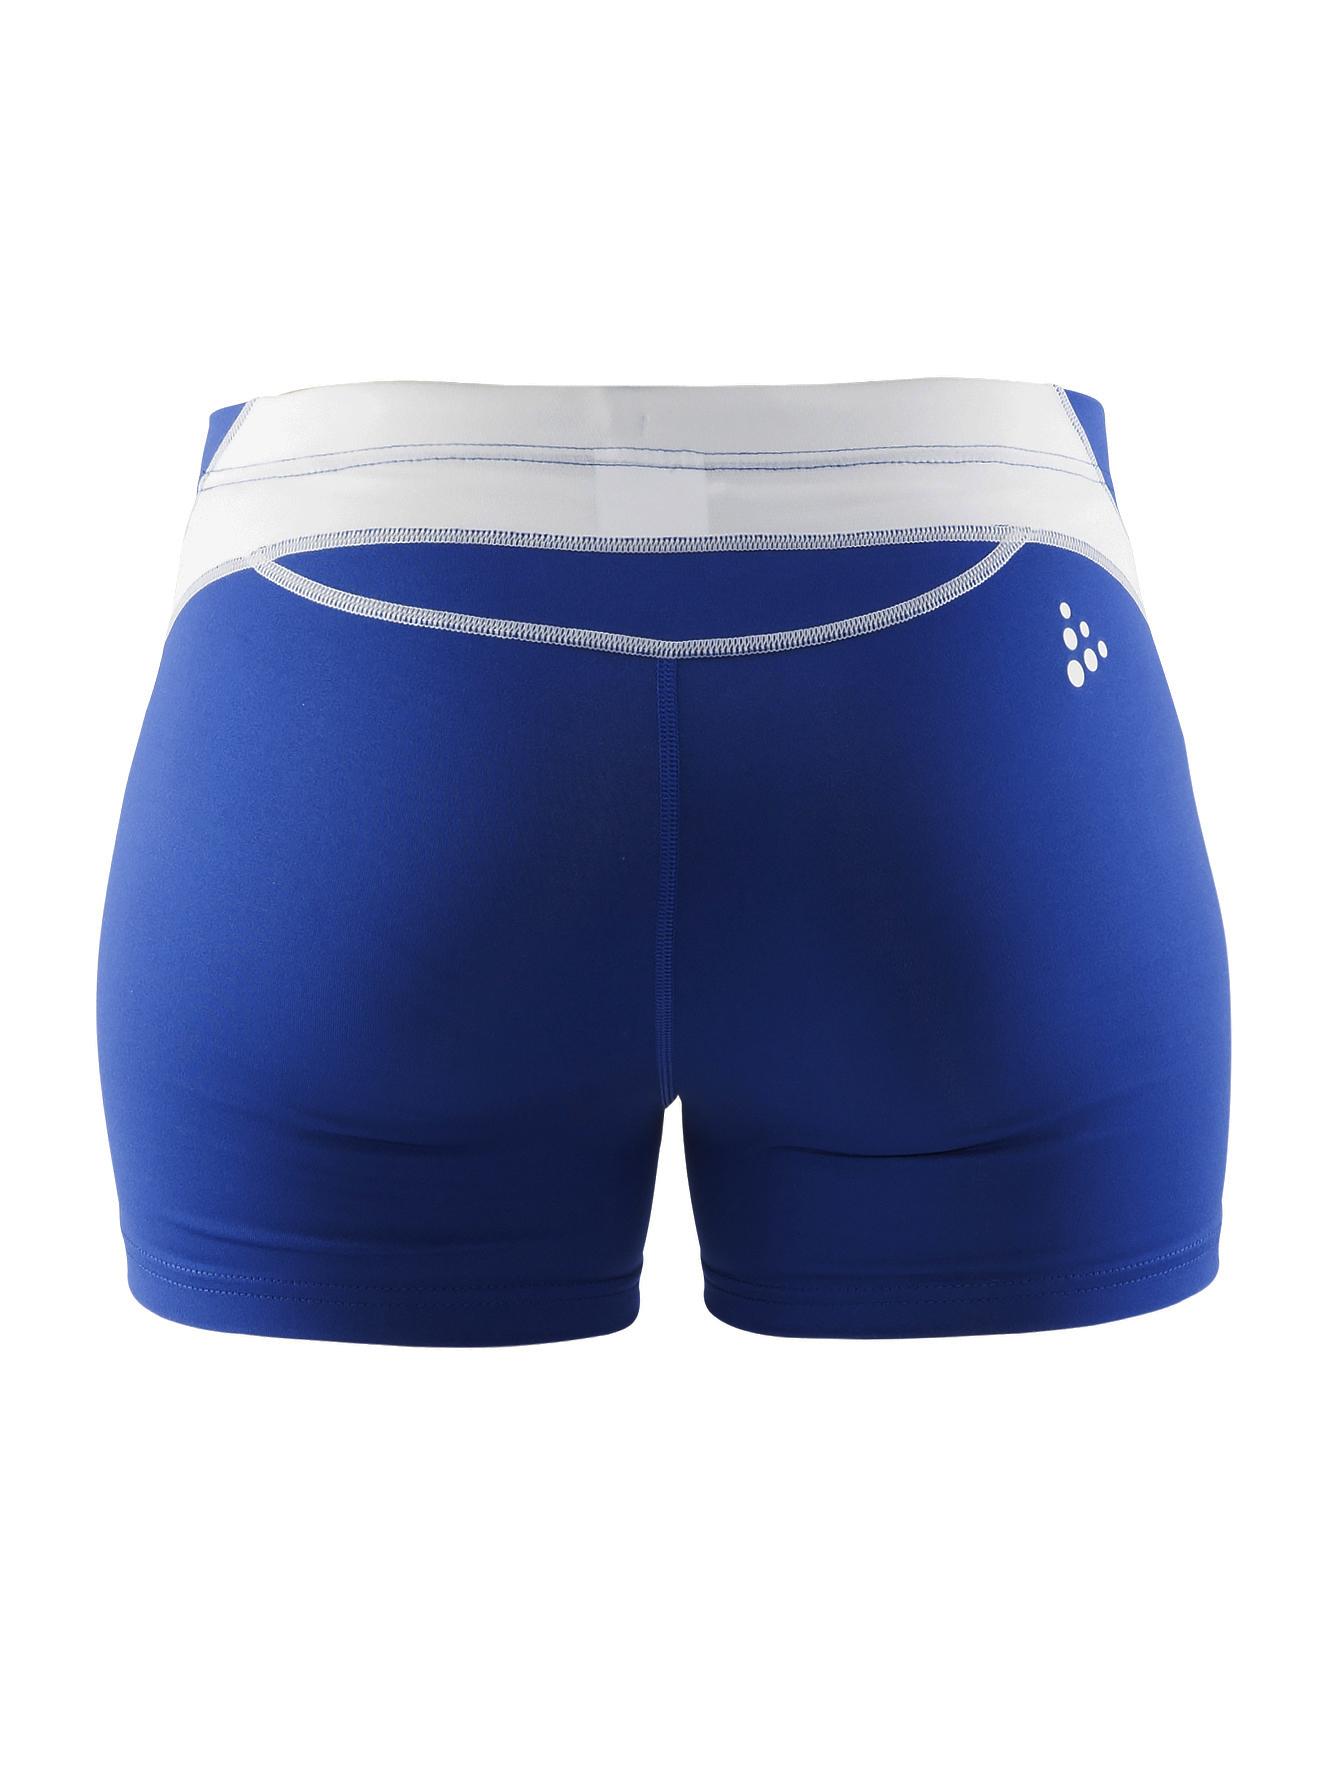 Шорты Craft Track and Field Hot Pants женские Blue для бега, фитнеса